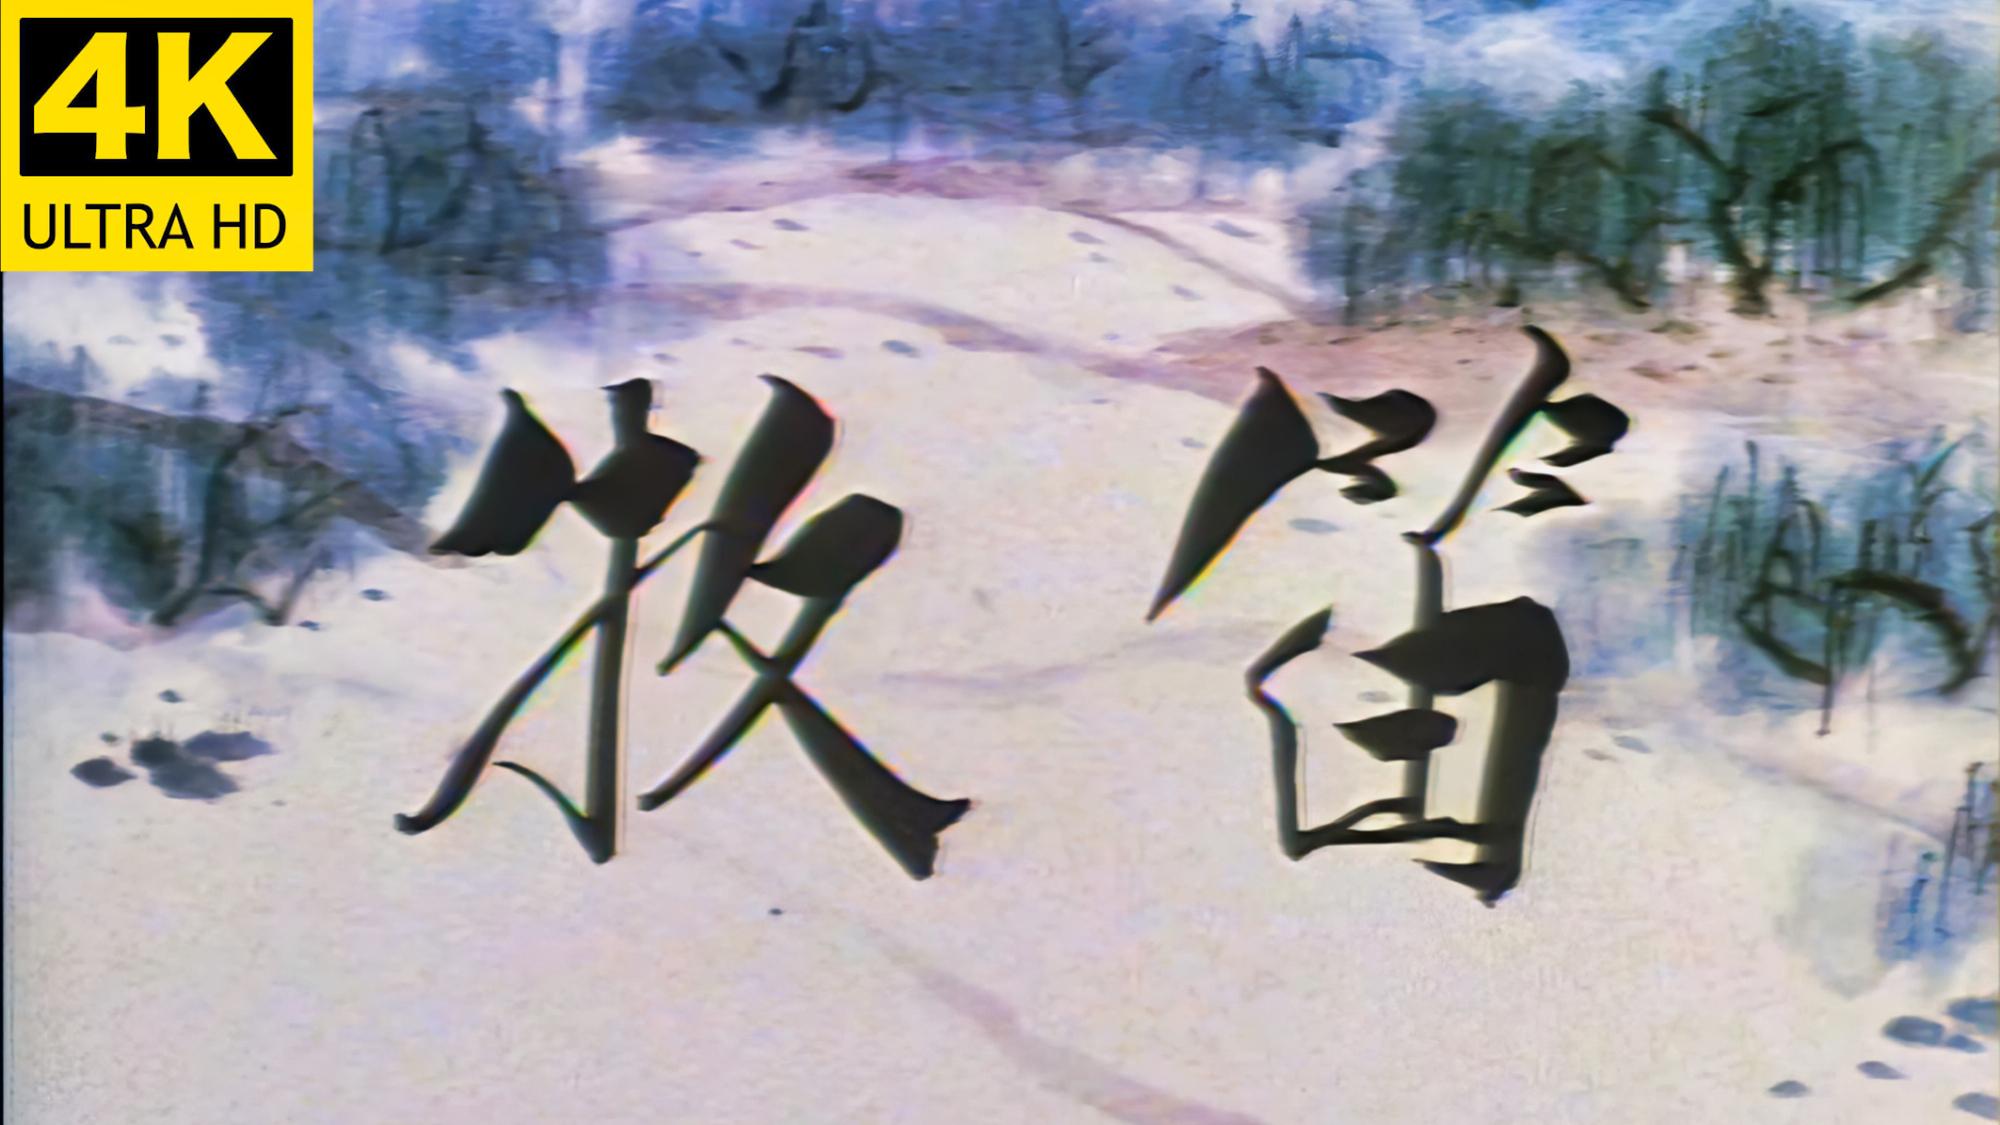 【4k修复60帧】牧笛—高清重制上美中国第二部水墨动画!